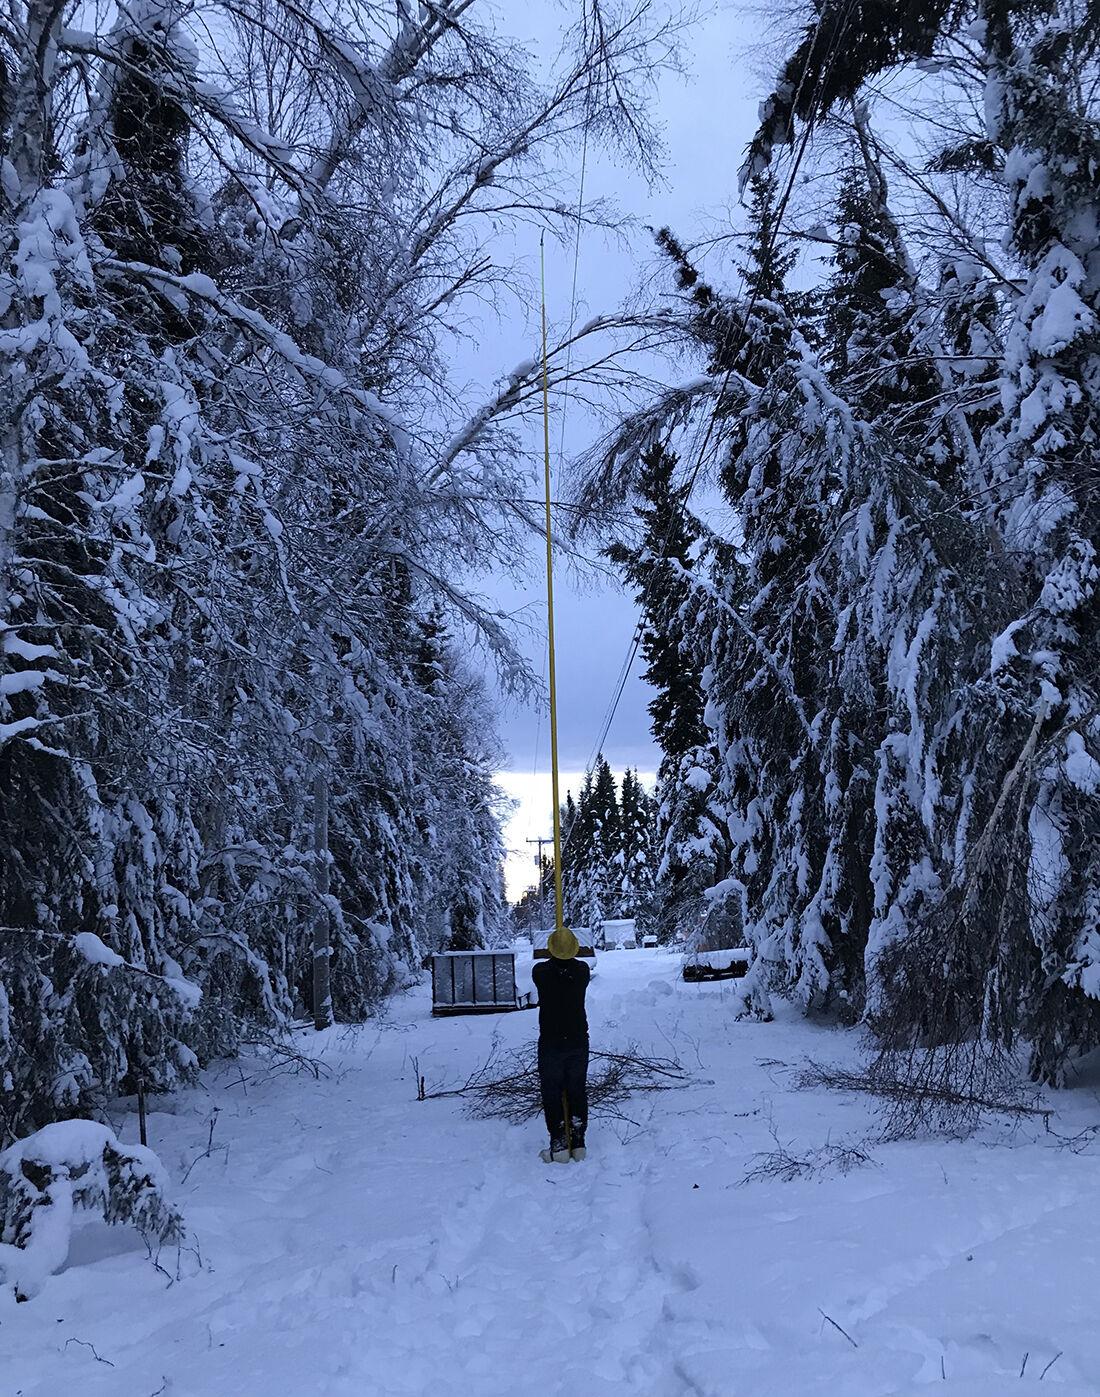 L11 (USE) LINEMEN Snow-related power line repair - photo by Ian Wiedmaier.jpg